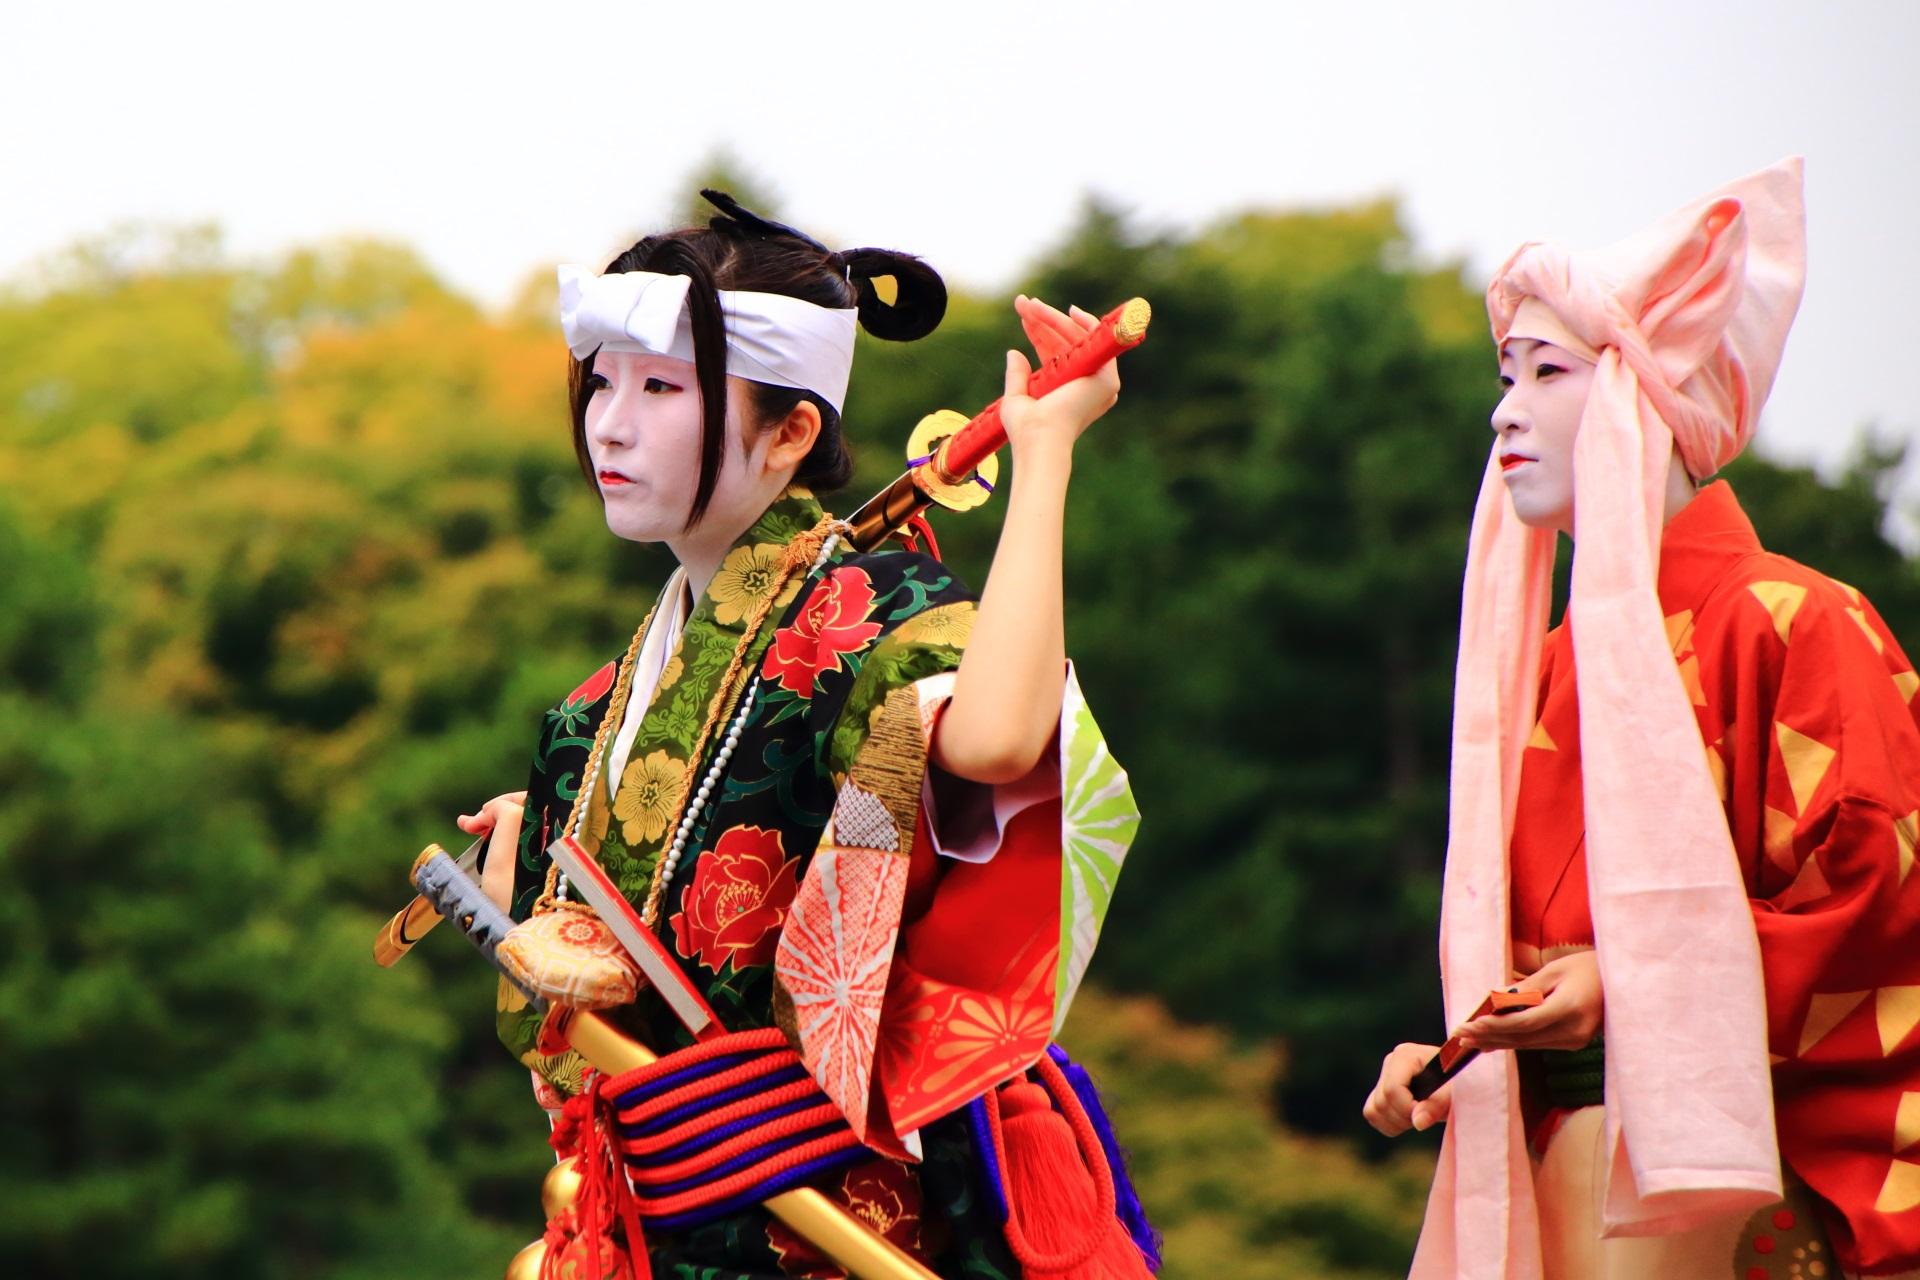 京都三大祭の江戸時代の出雲阿国